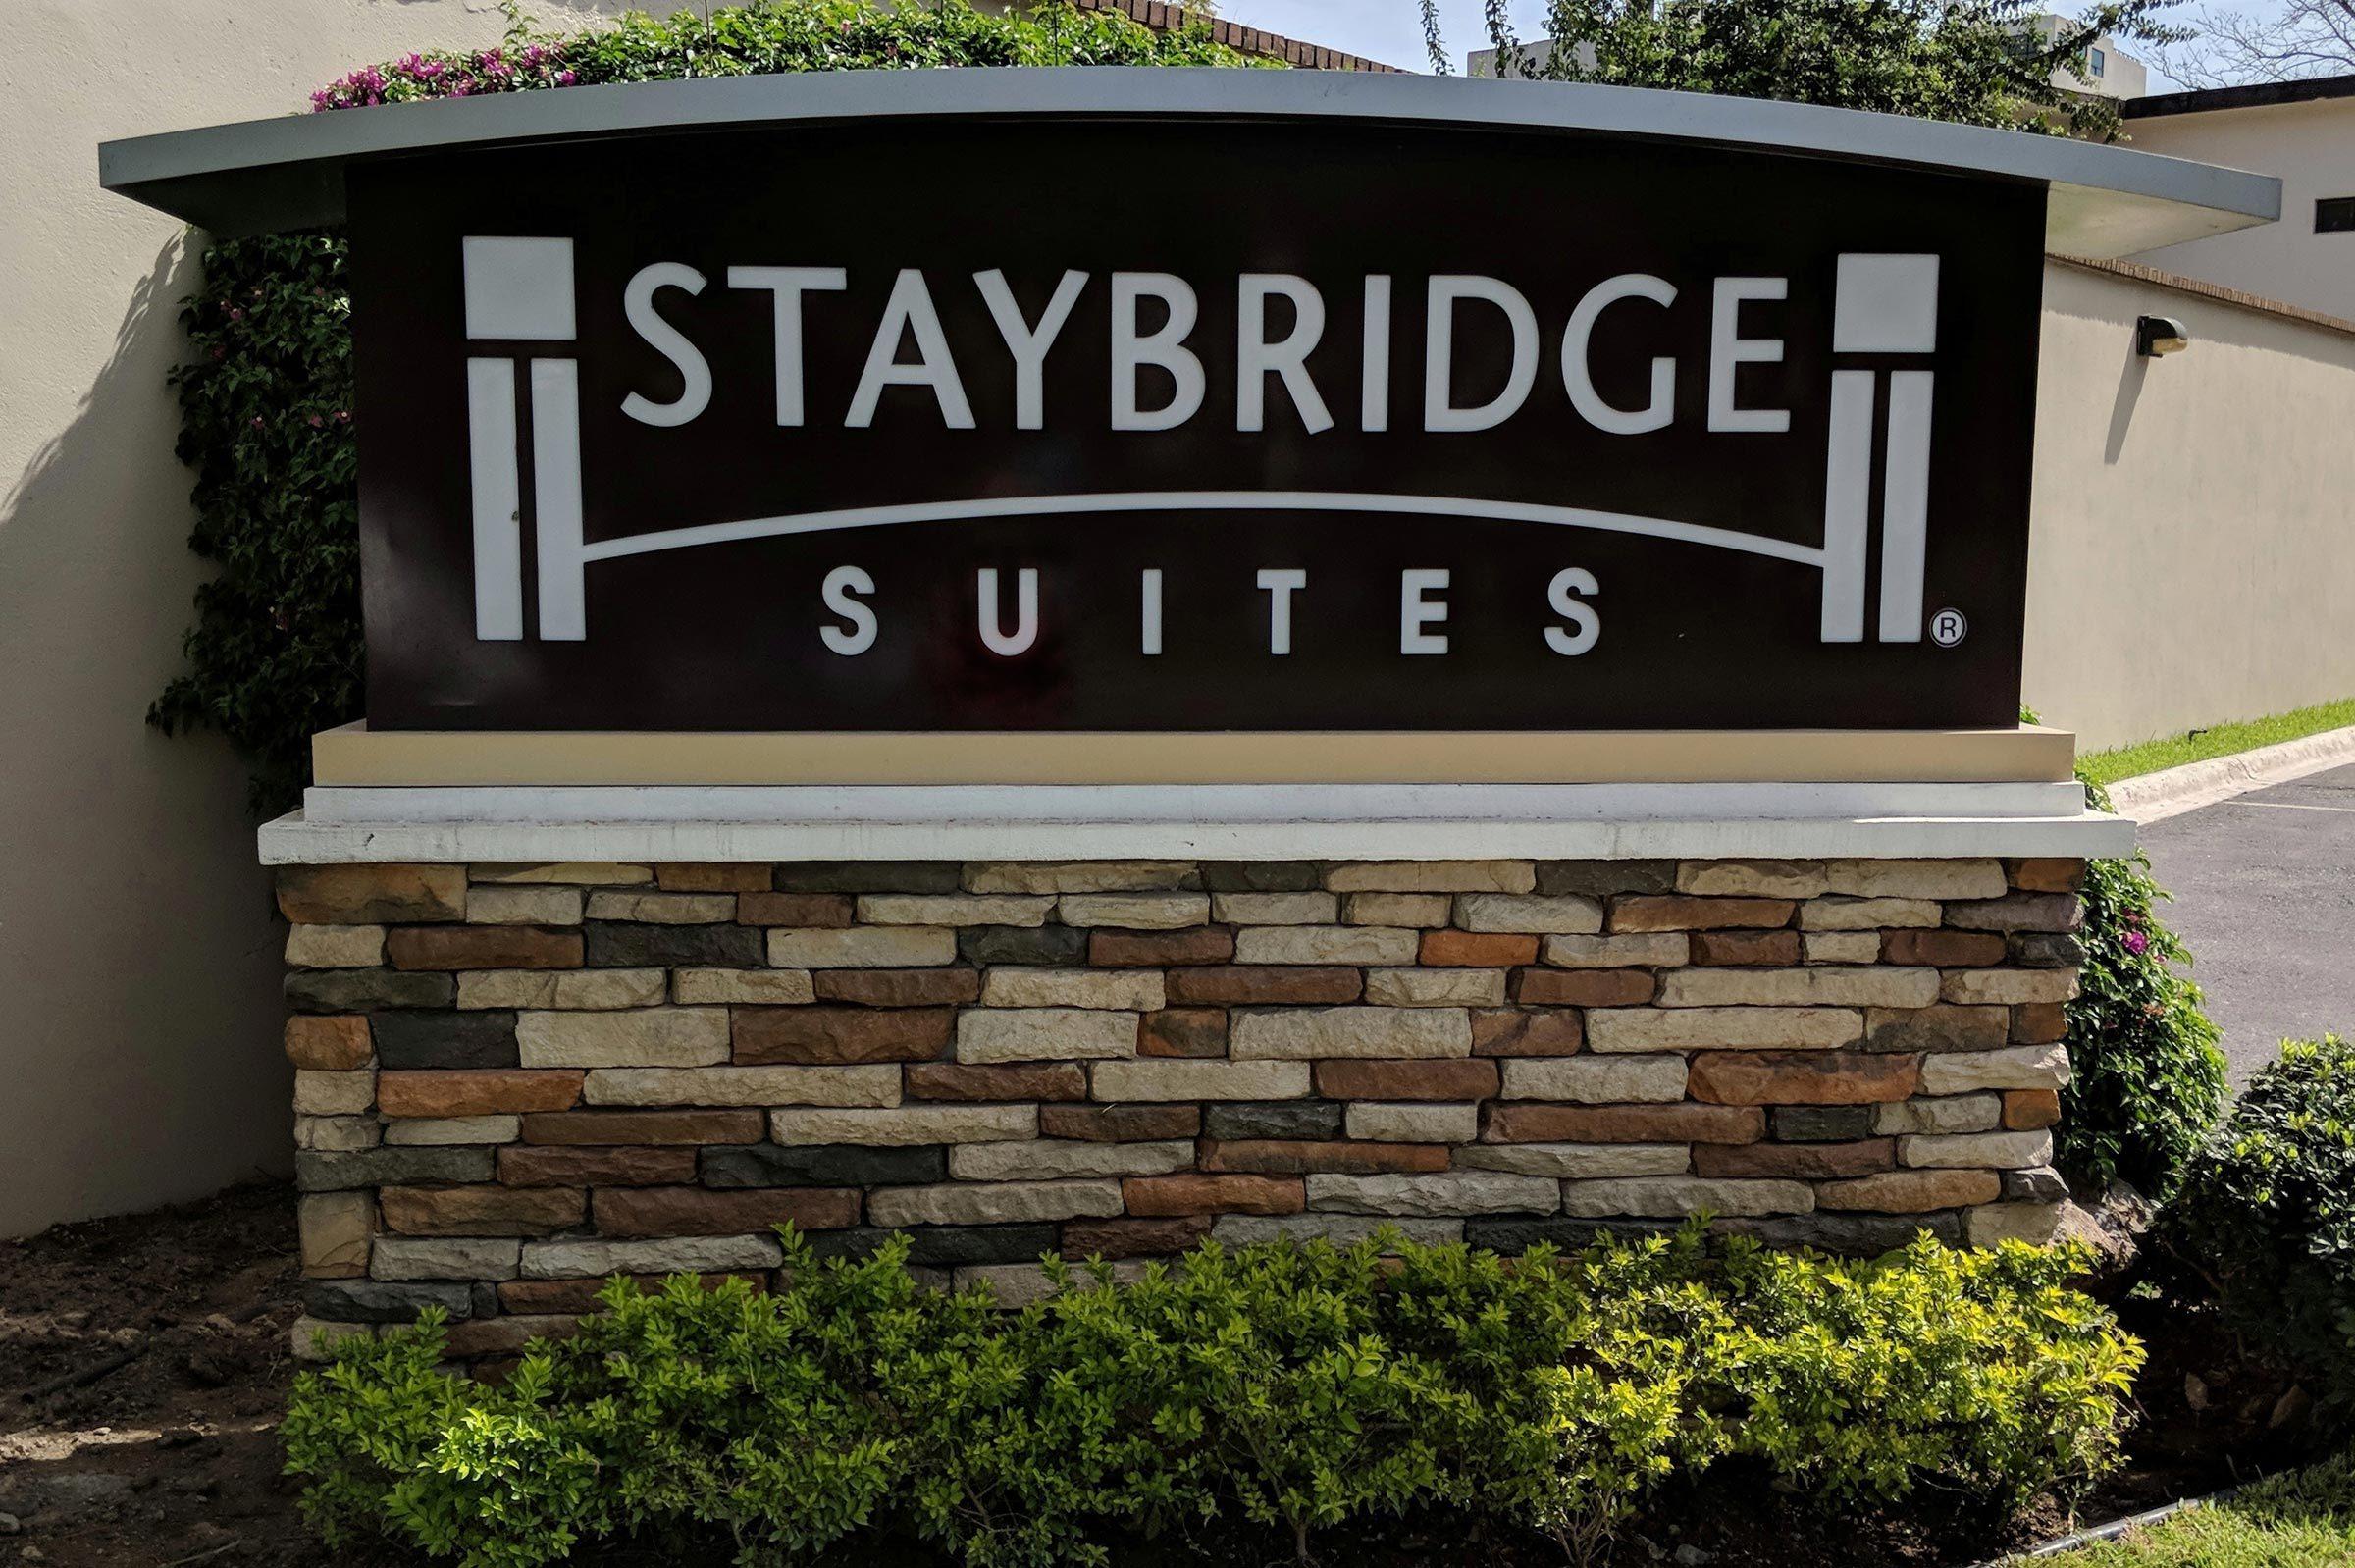 Monterrey, Nuevo Leon, Mexico - March 3, 2018: Sign at entrance to Staybridge Suites San Pedro.